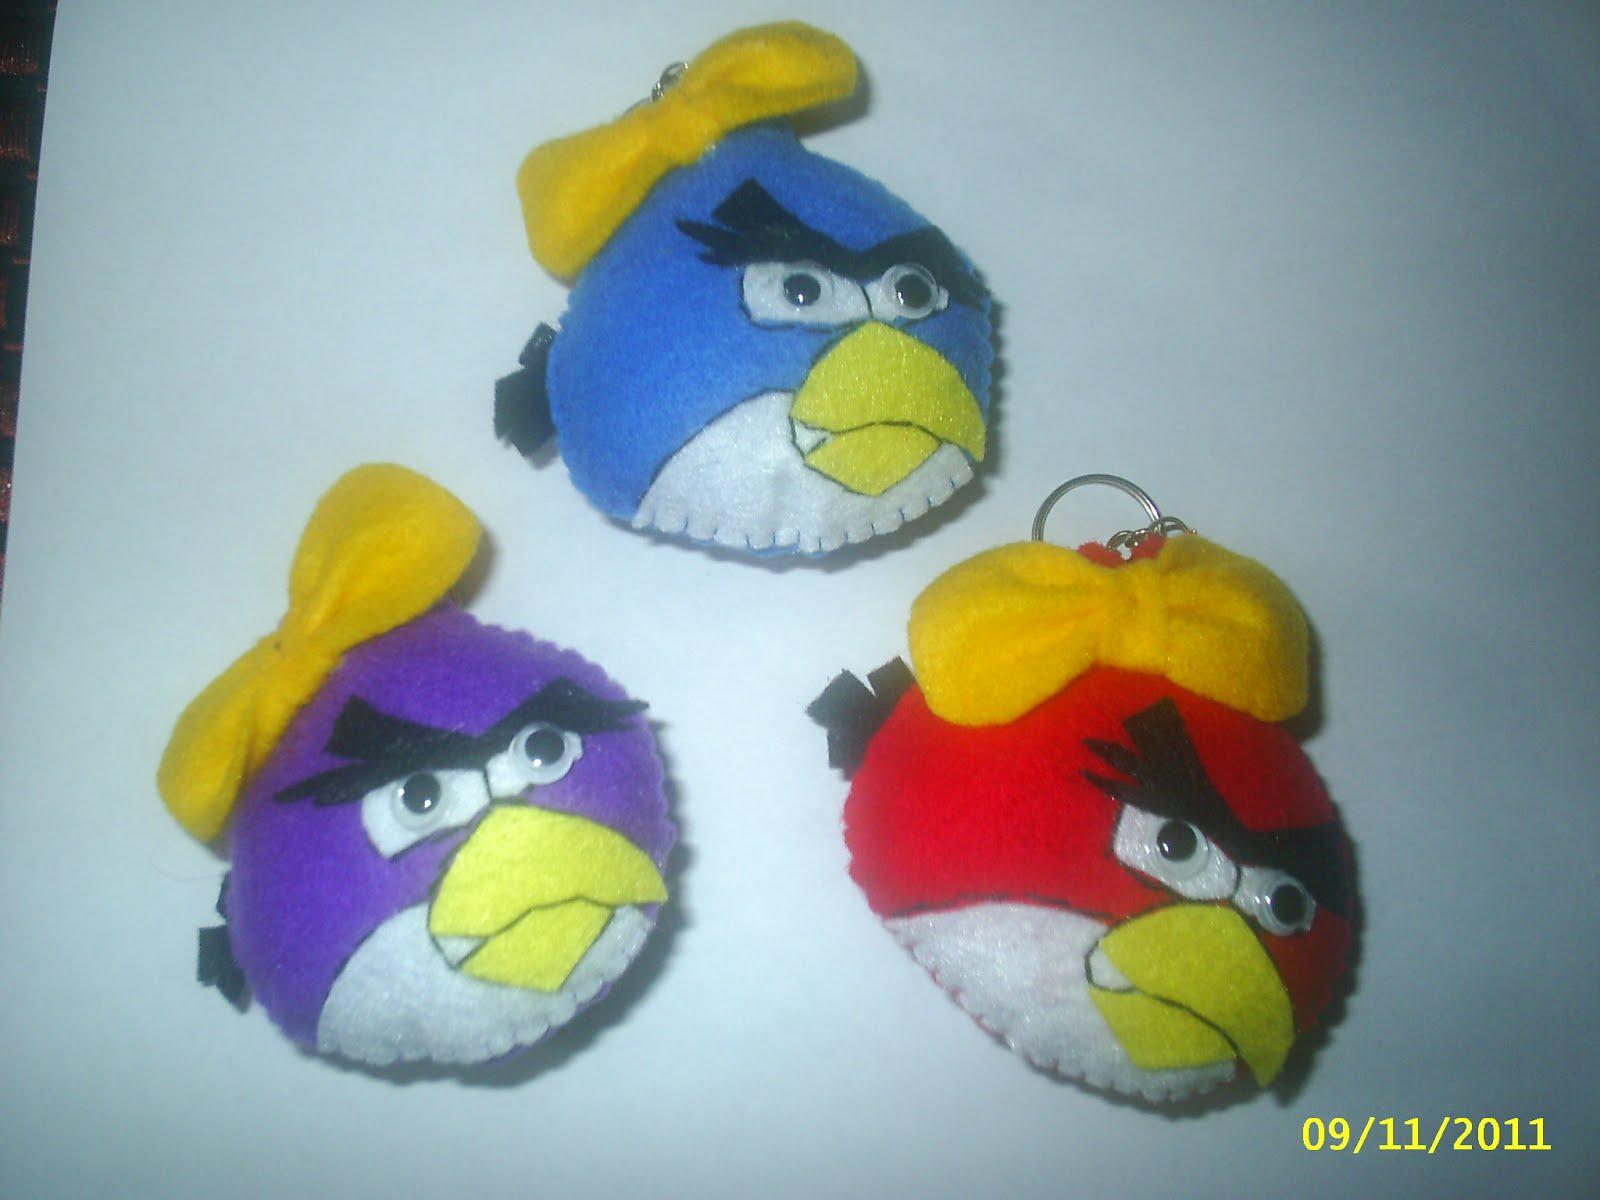 Psst...keychain angry bird ni jg termasuk dlm hasil f.craft yg anda